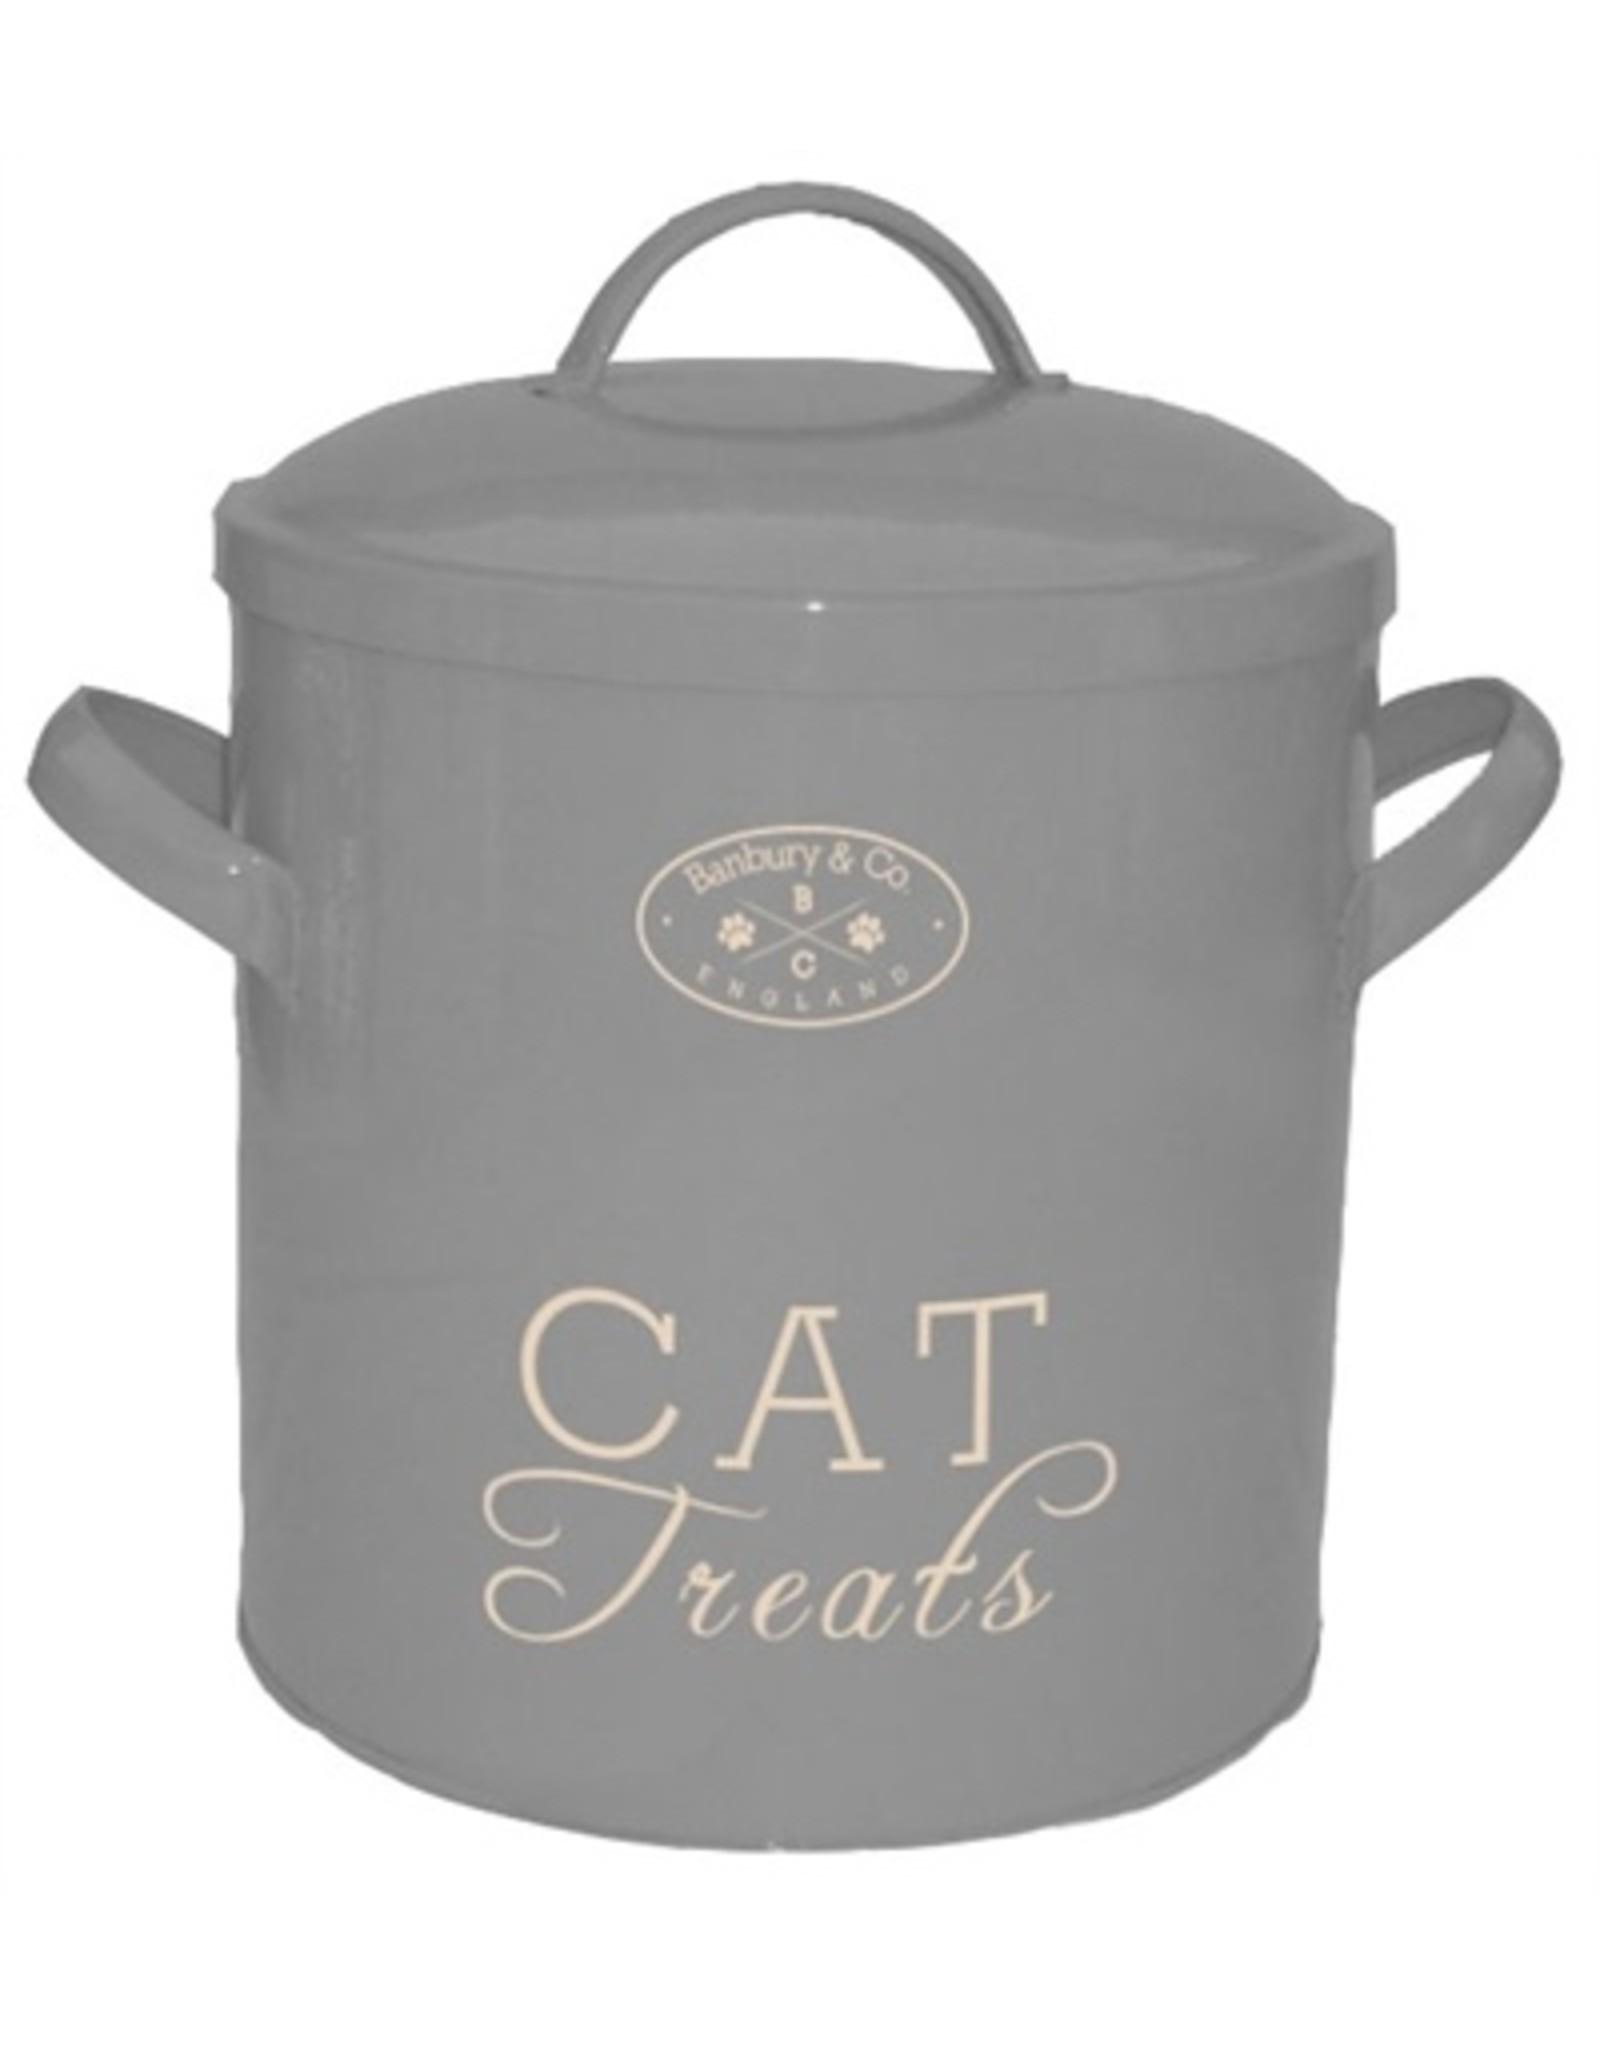 Banbury & co Banbury & co voorraadpot kat tin